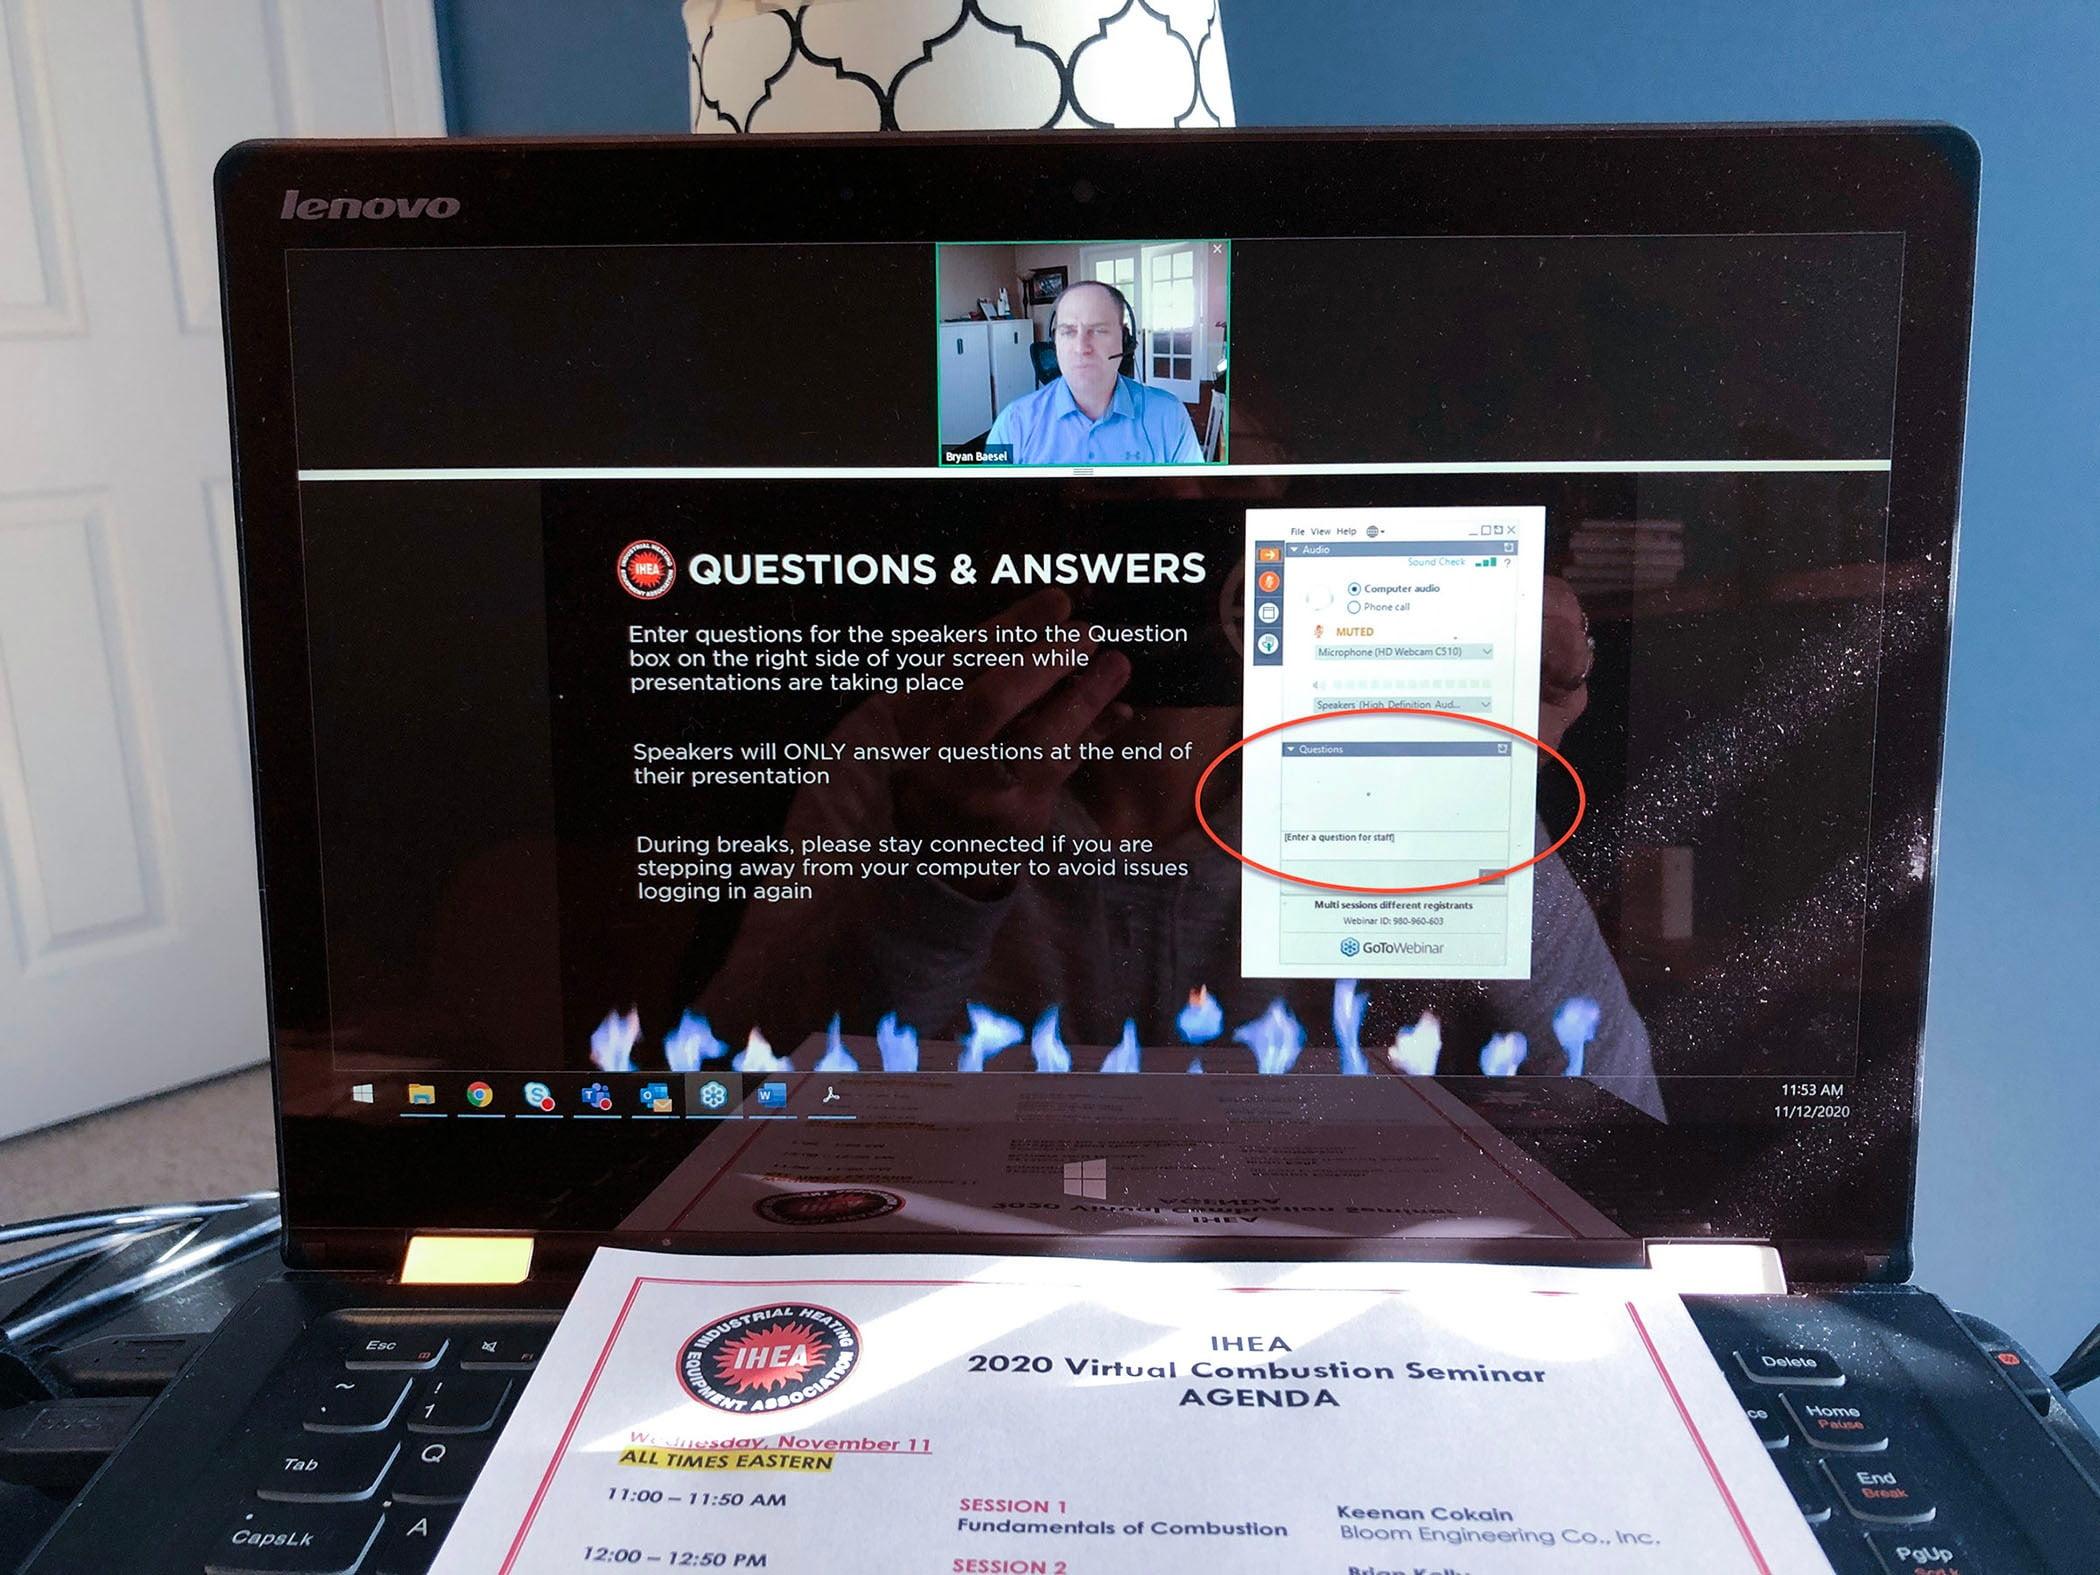 Flat panel display, Personal computer, Netbook, Font, Gadget